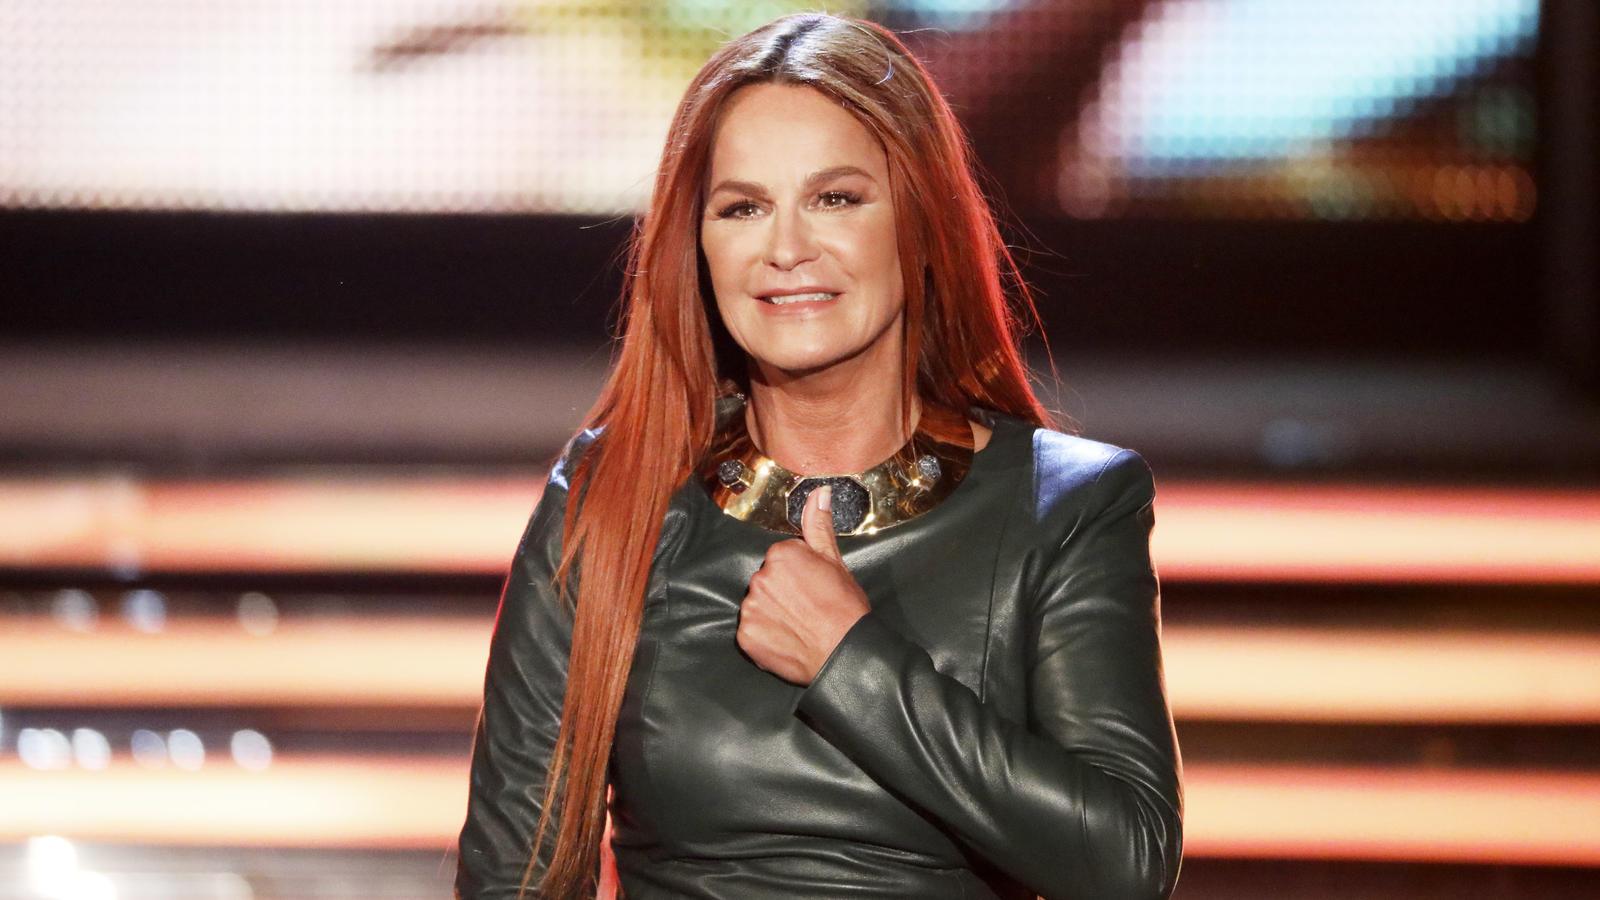 Andrea Berg Kündigt Neue Konzerte Für Oktober An